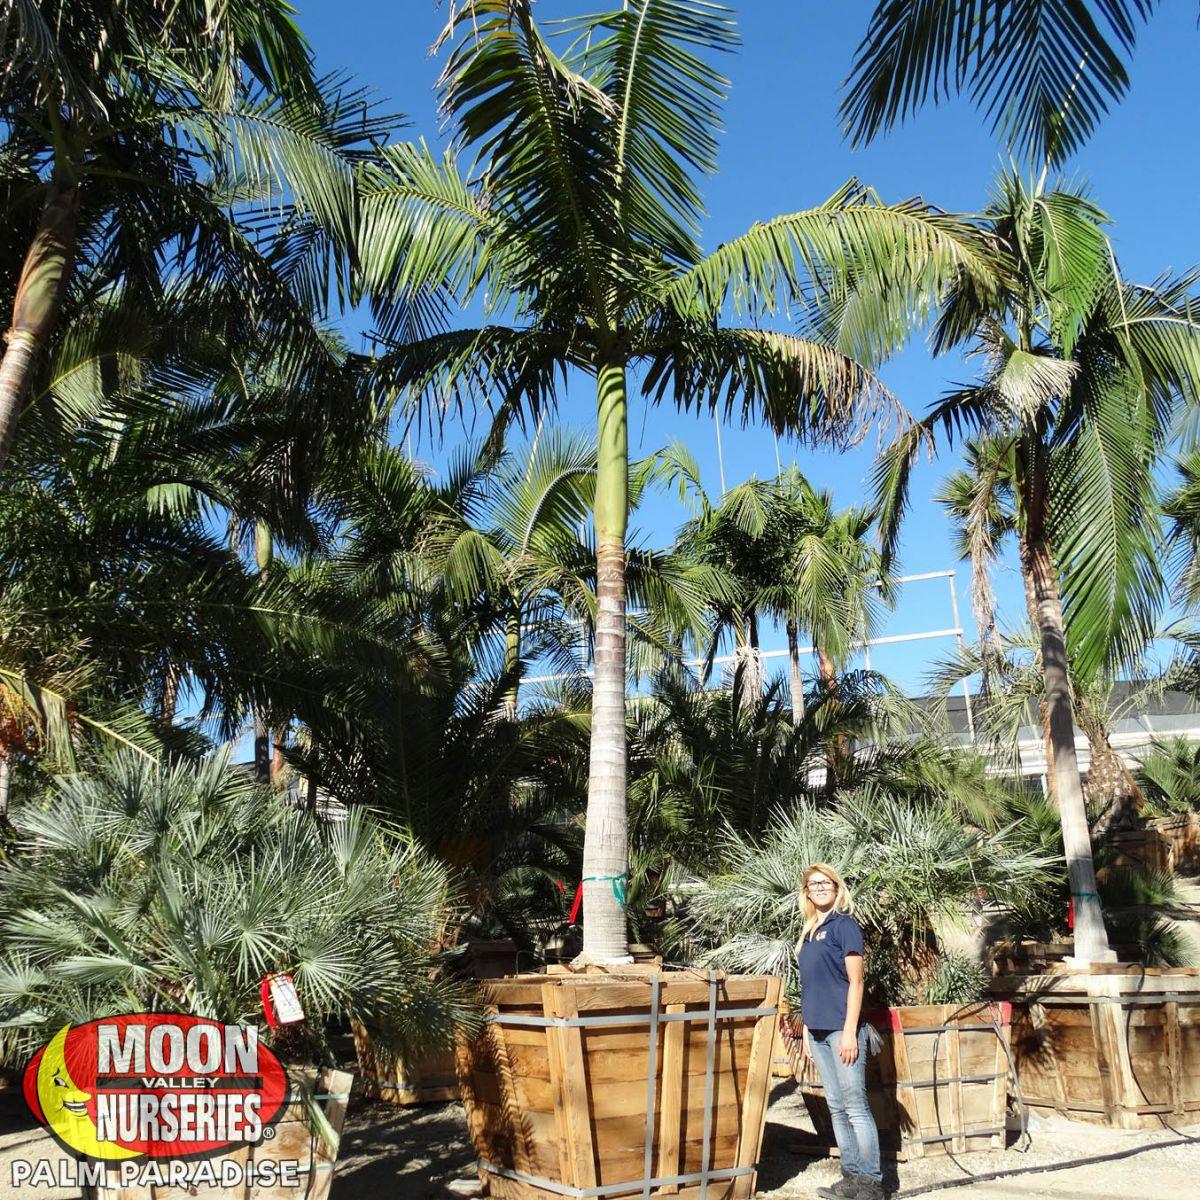 King Palm Palm Tree Palm Paradise Nursery